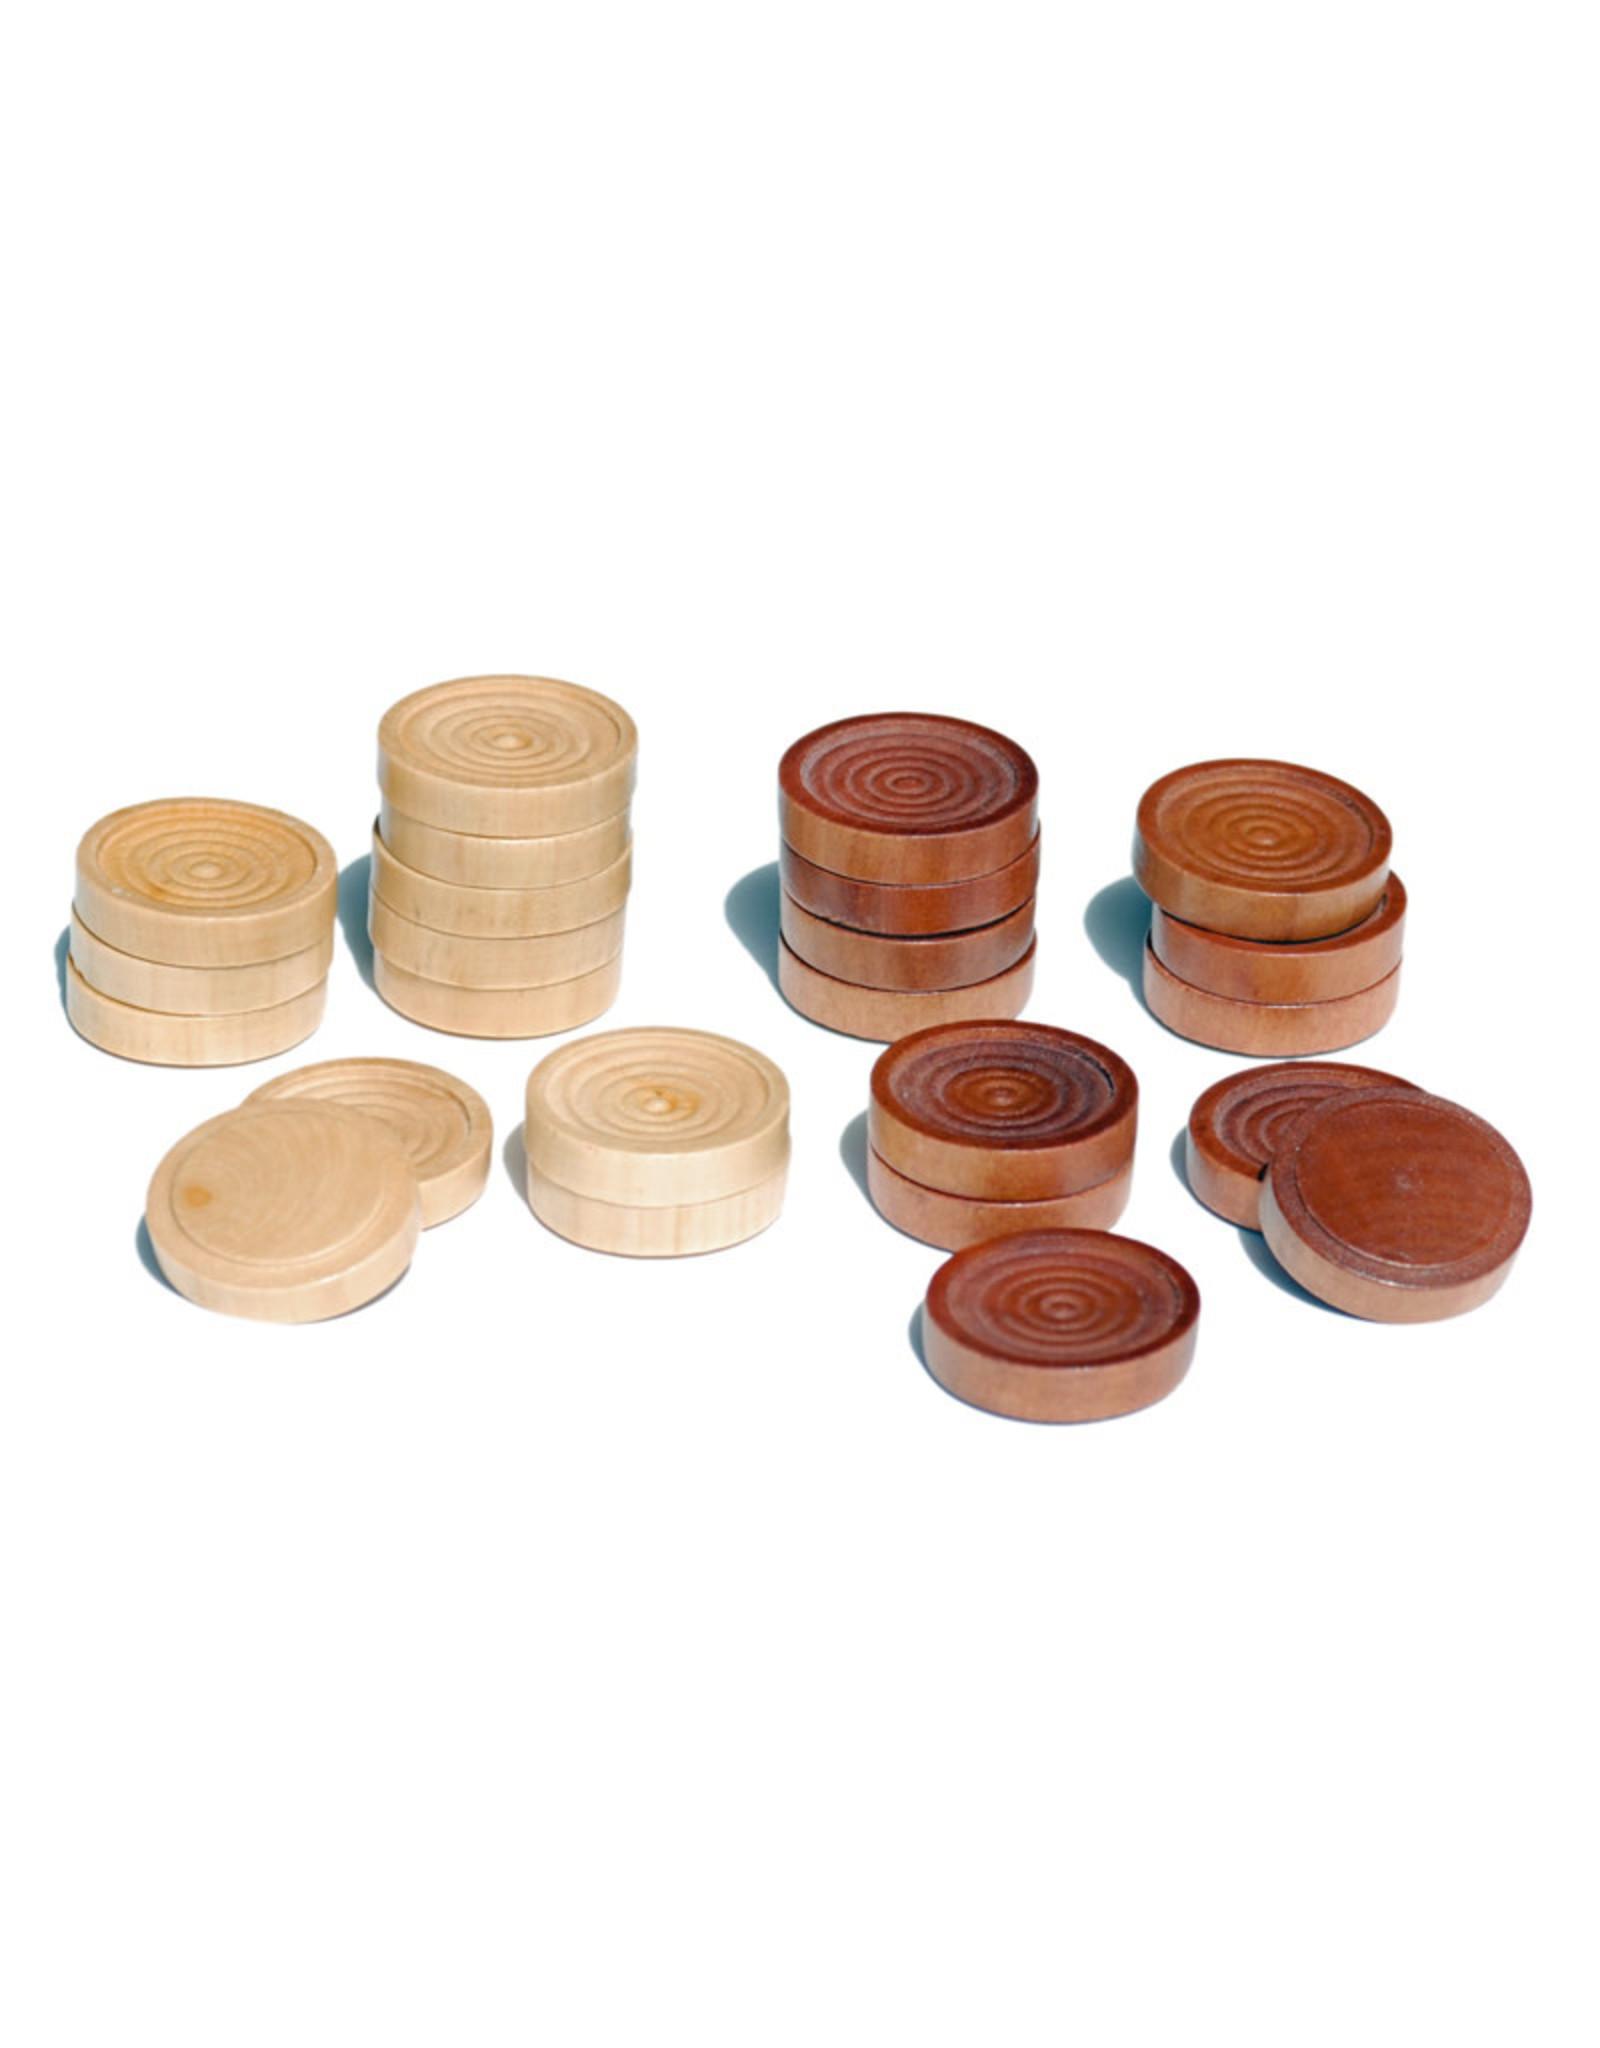 Checkers Set 12 Inch Walnut Natural Wood